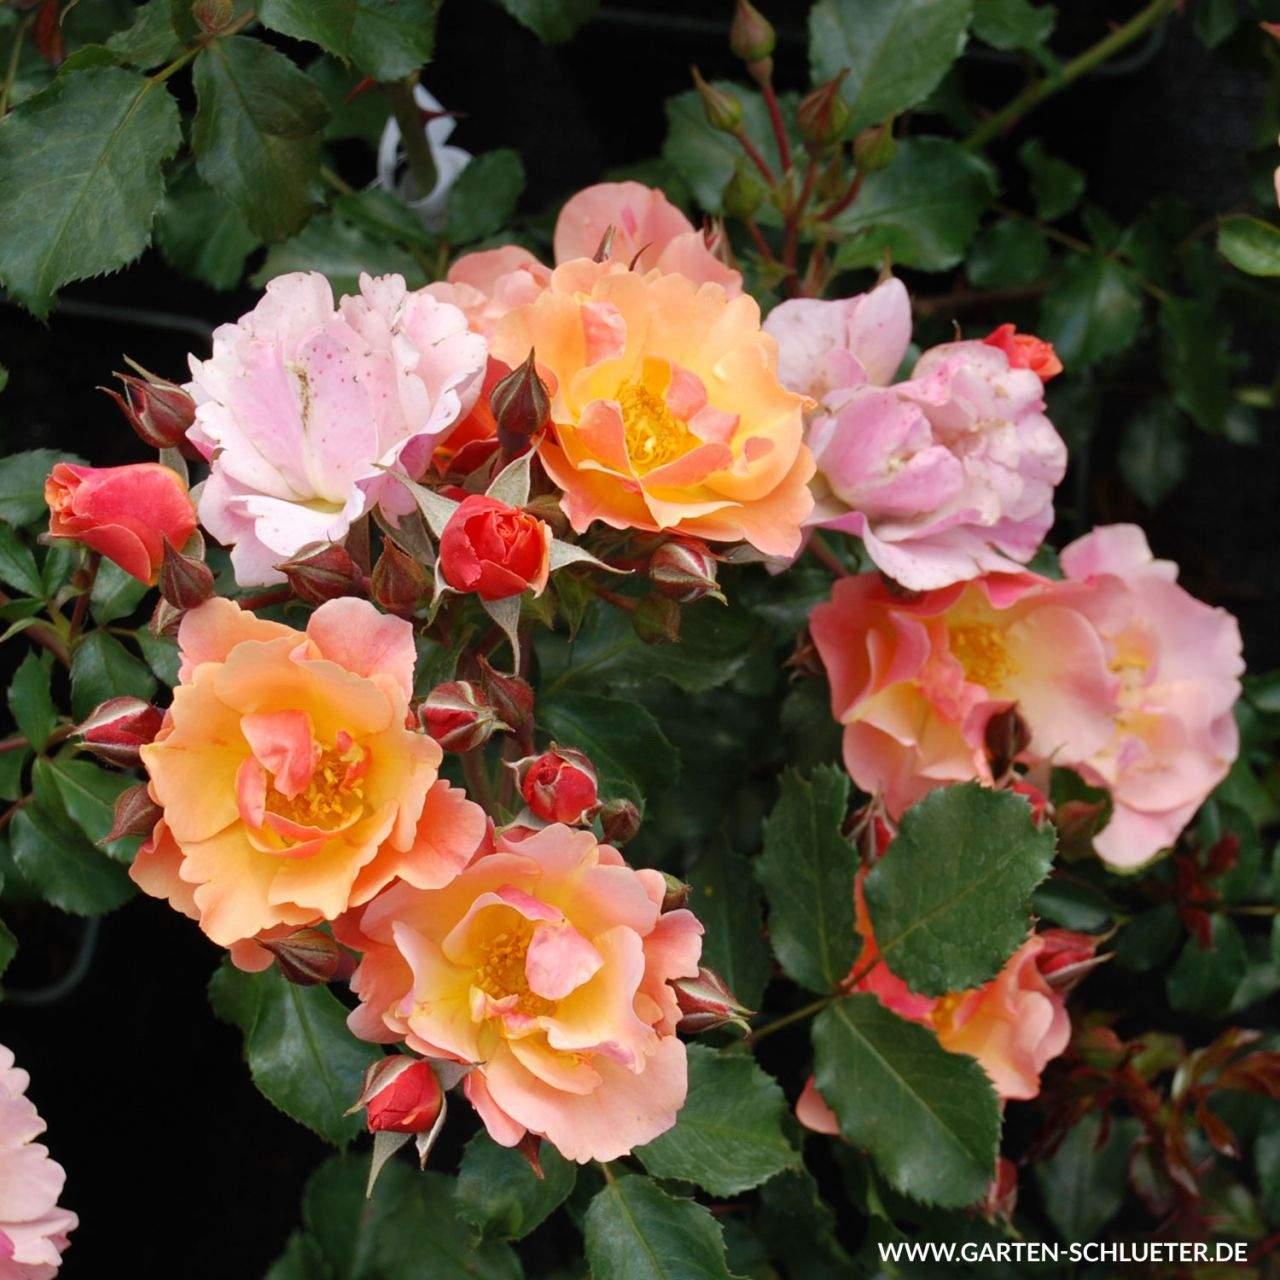 10 Bodendeckerrose Jazz Rosa Jazz 1280x1280